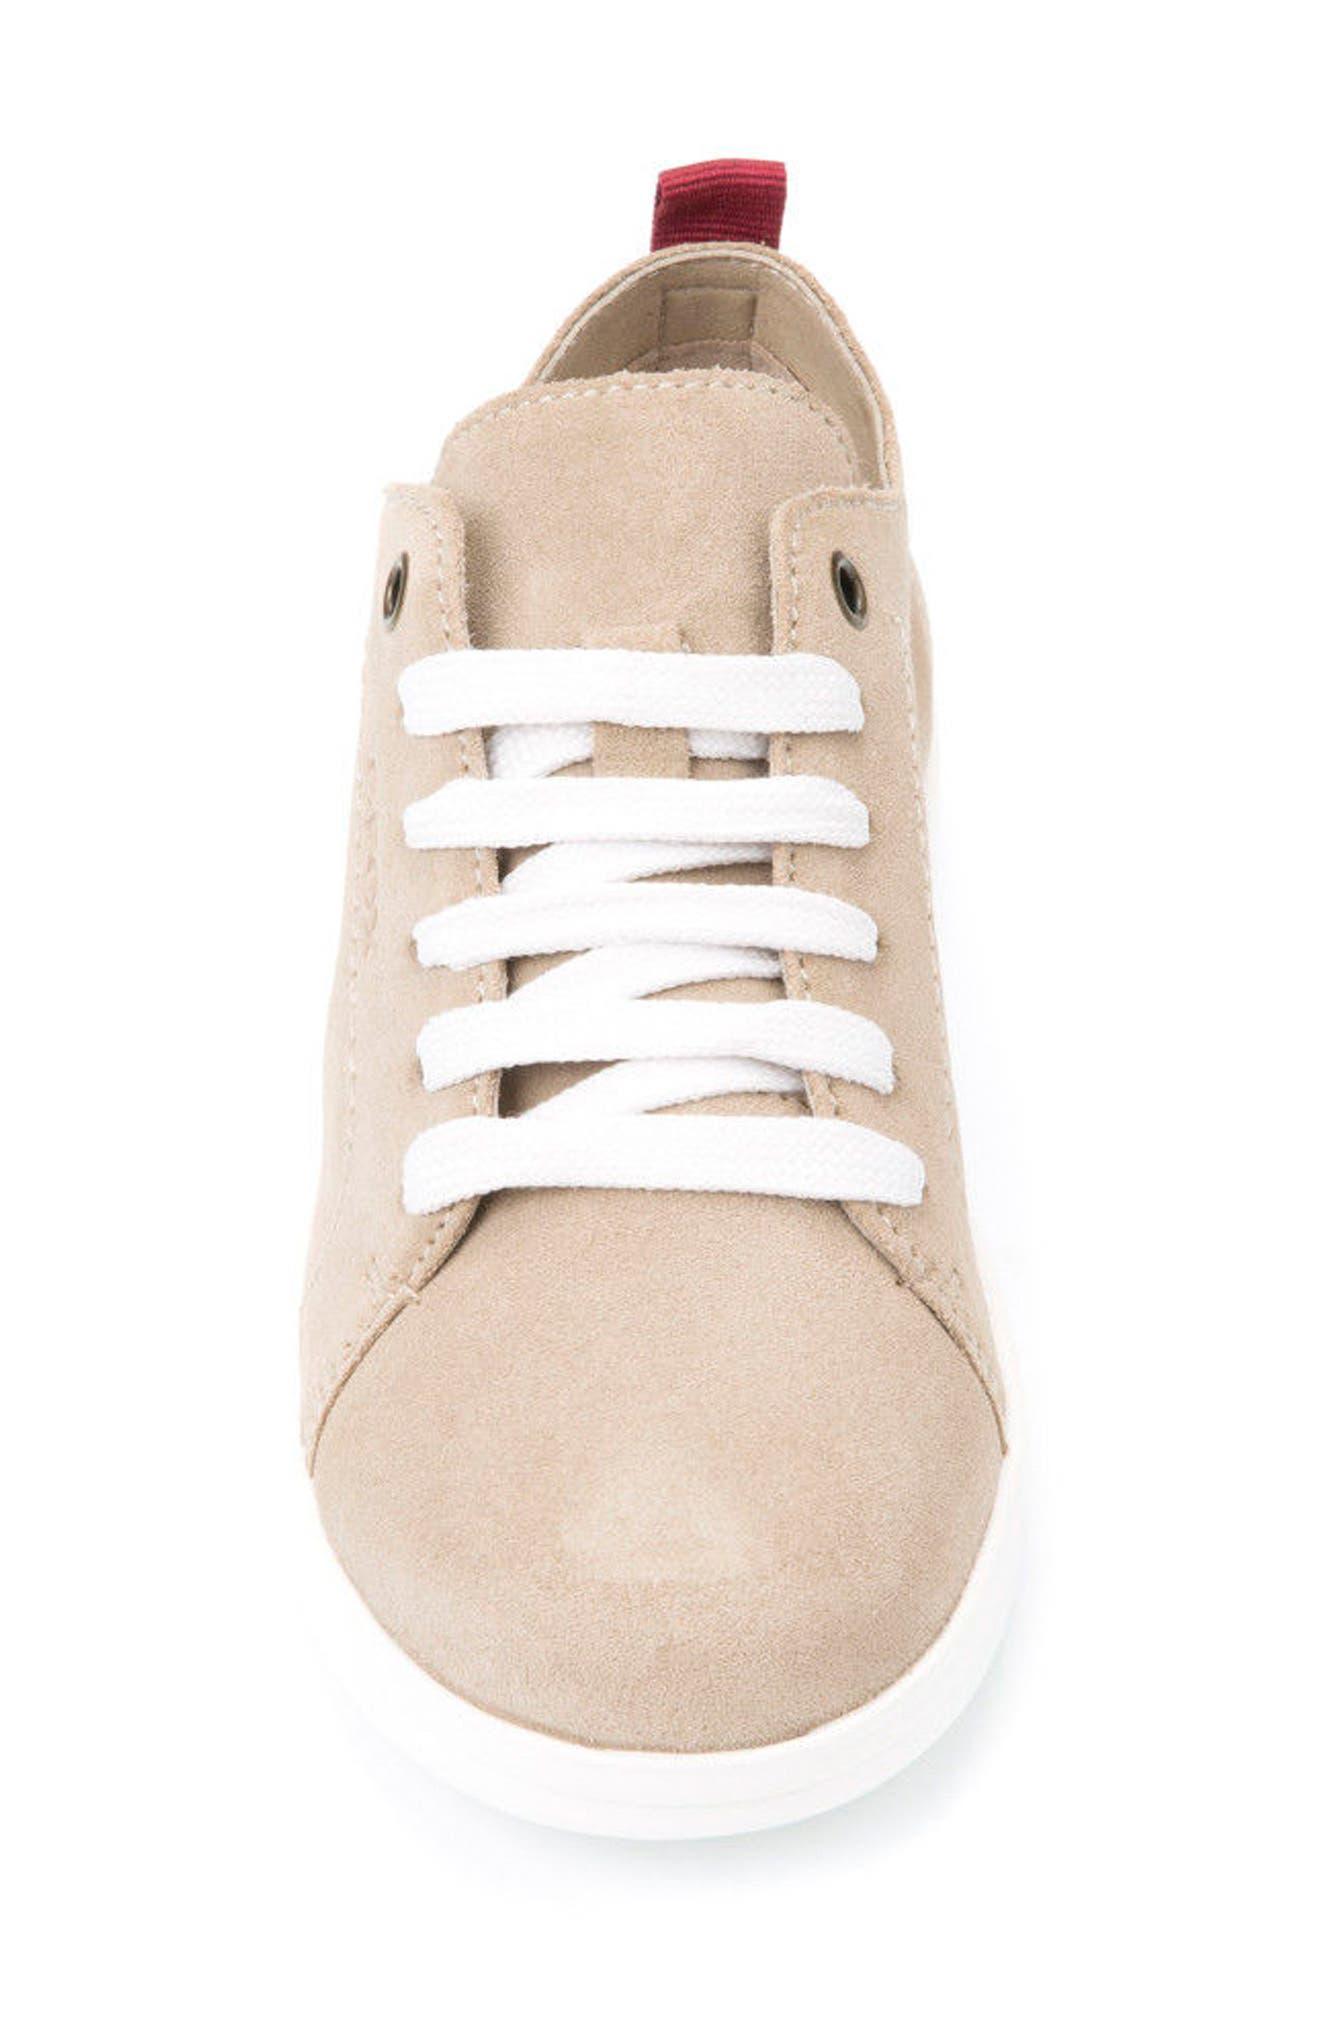 Anthor Low Top Sneaker,                             Alternate thumbnail 4, color,                             BEIGE